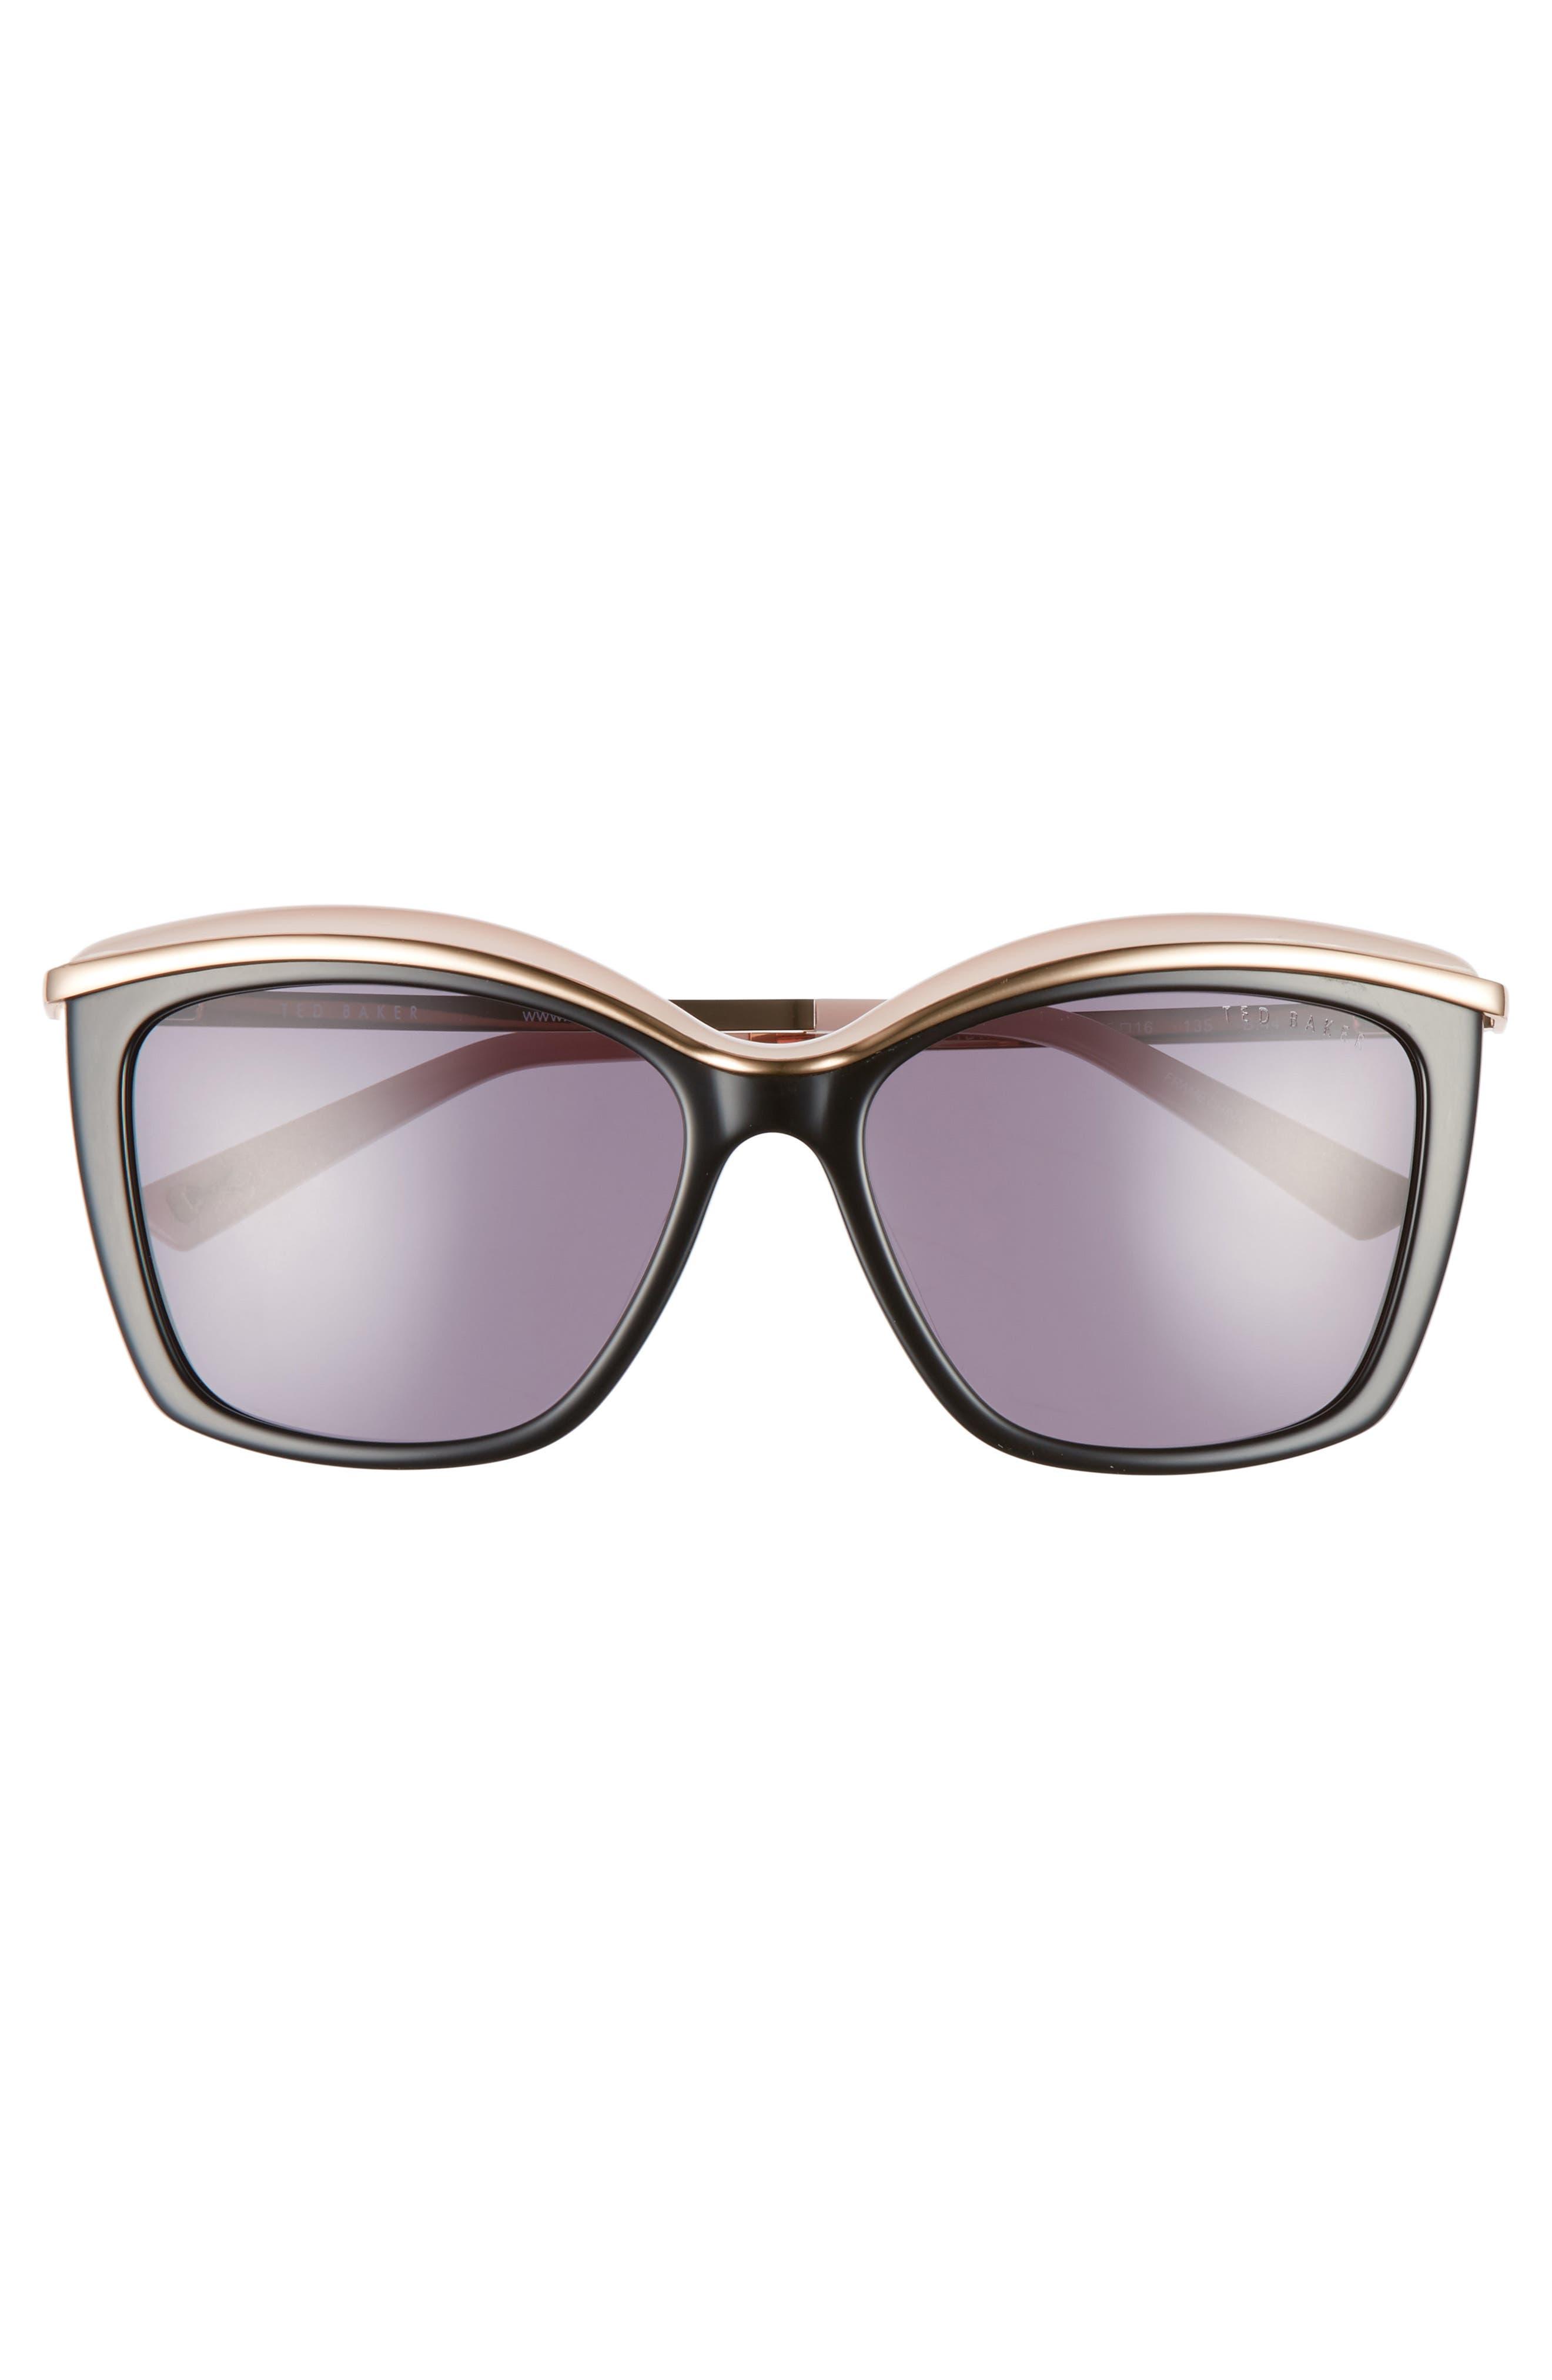 55mm Cat Eye Sunglasses,                             Alternate thumbnail 3, color,                             001